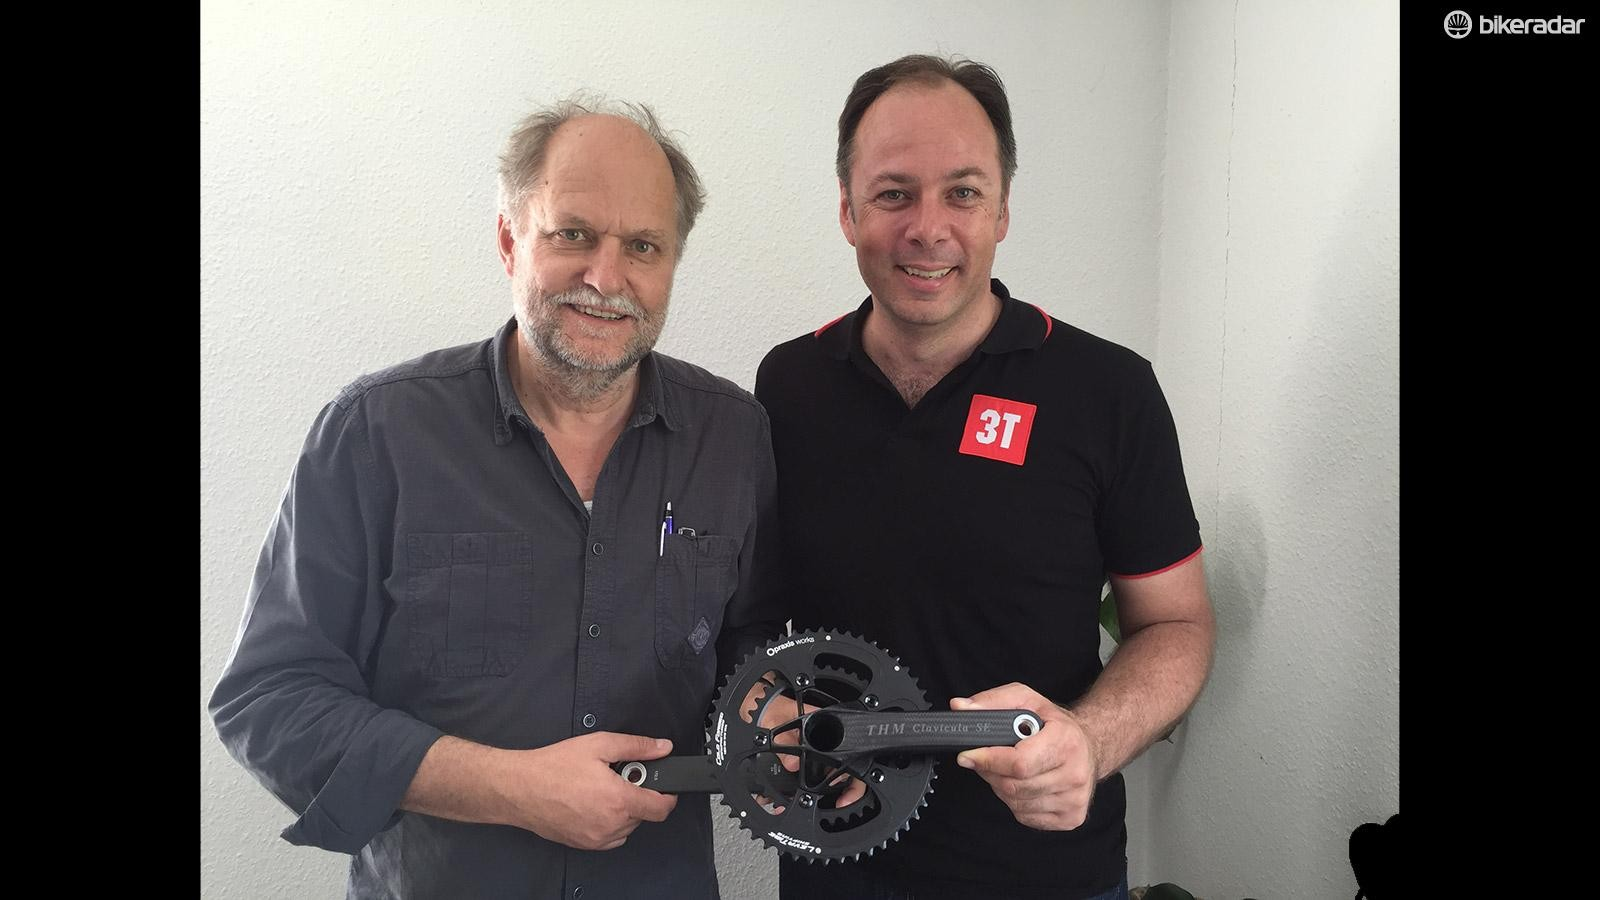 3T CEO Rene Wiertz and THM founder Thomas Mertin